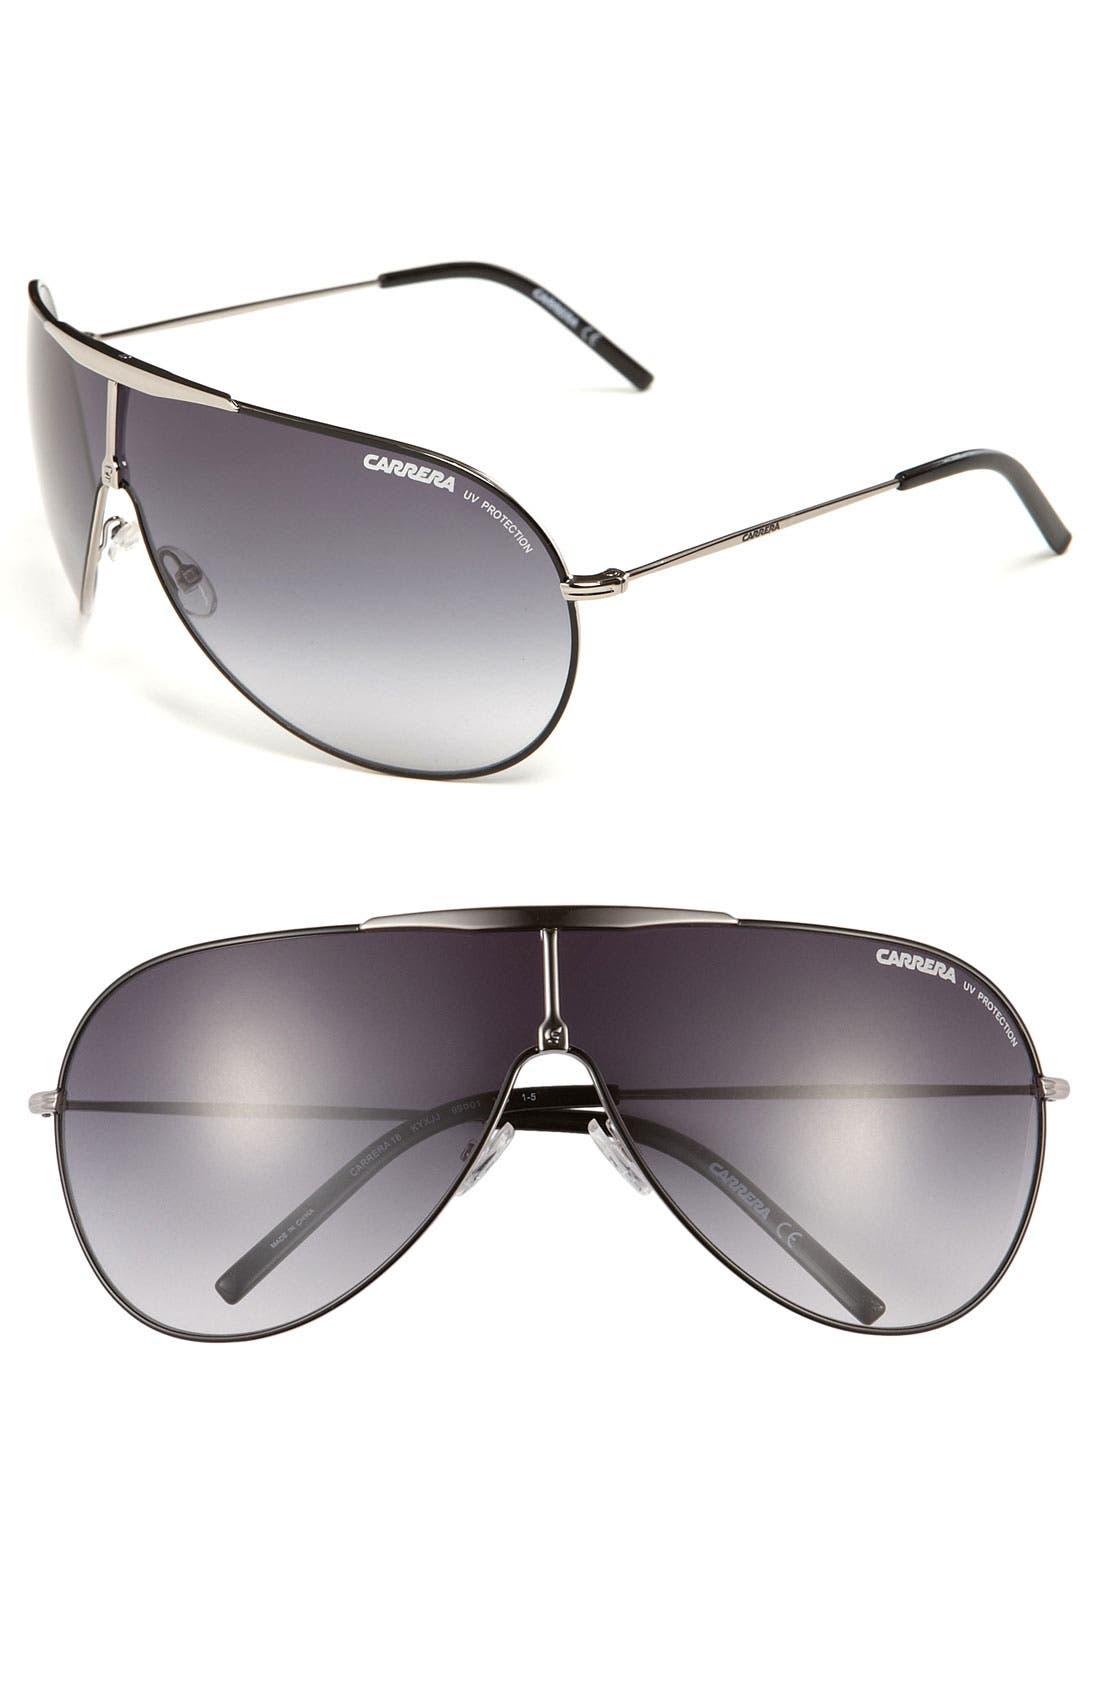 Main Image - Carrera Eyewear Shield Sunglasses